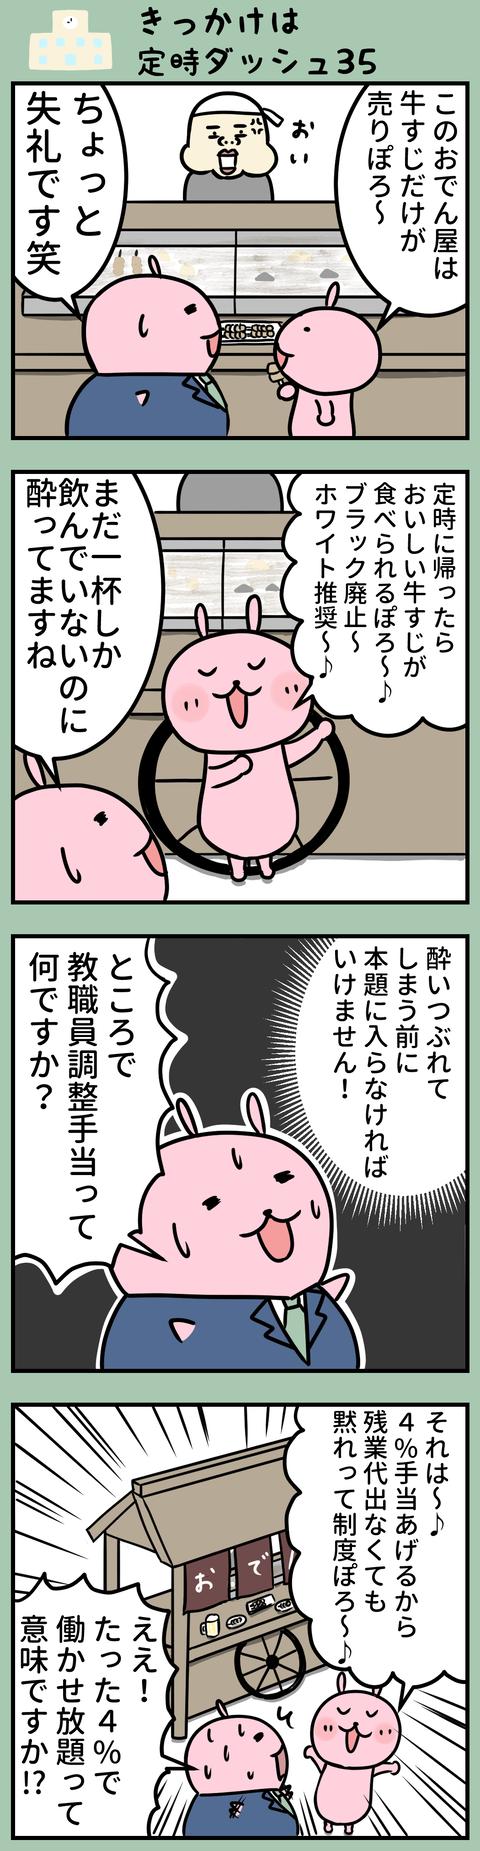 manga-yuzuporo102-1